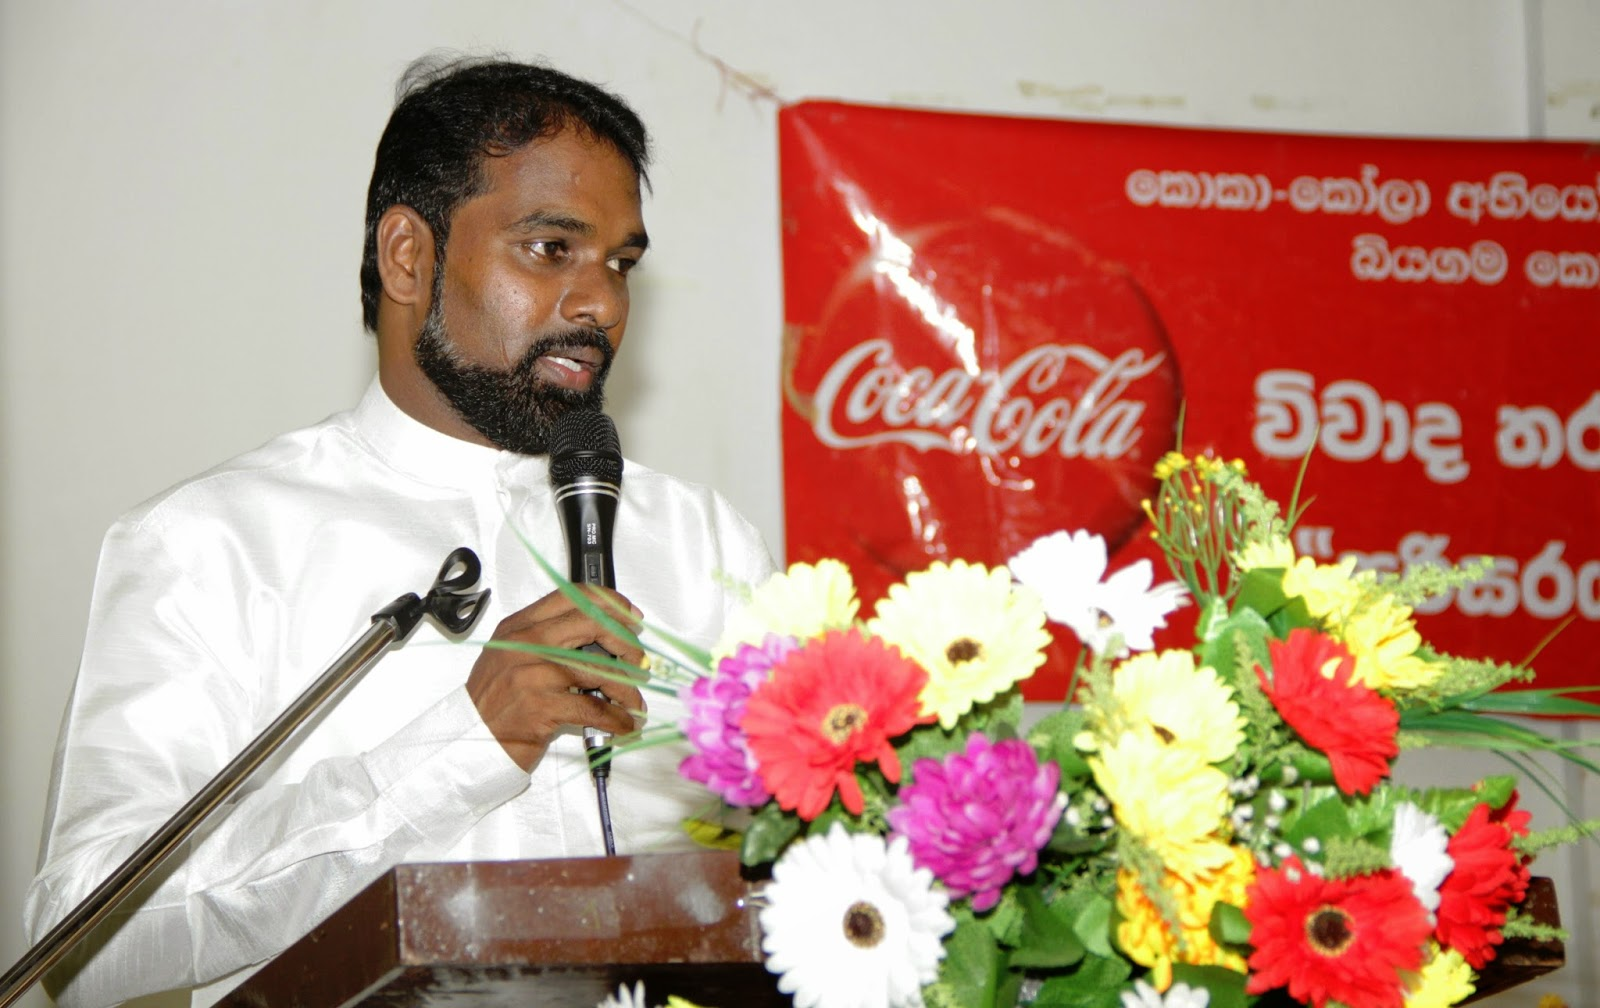 Guest of Honour, Hon. Gunasiri Jayanath, Member of Provincial Council speaks at the event.